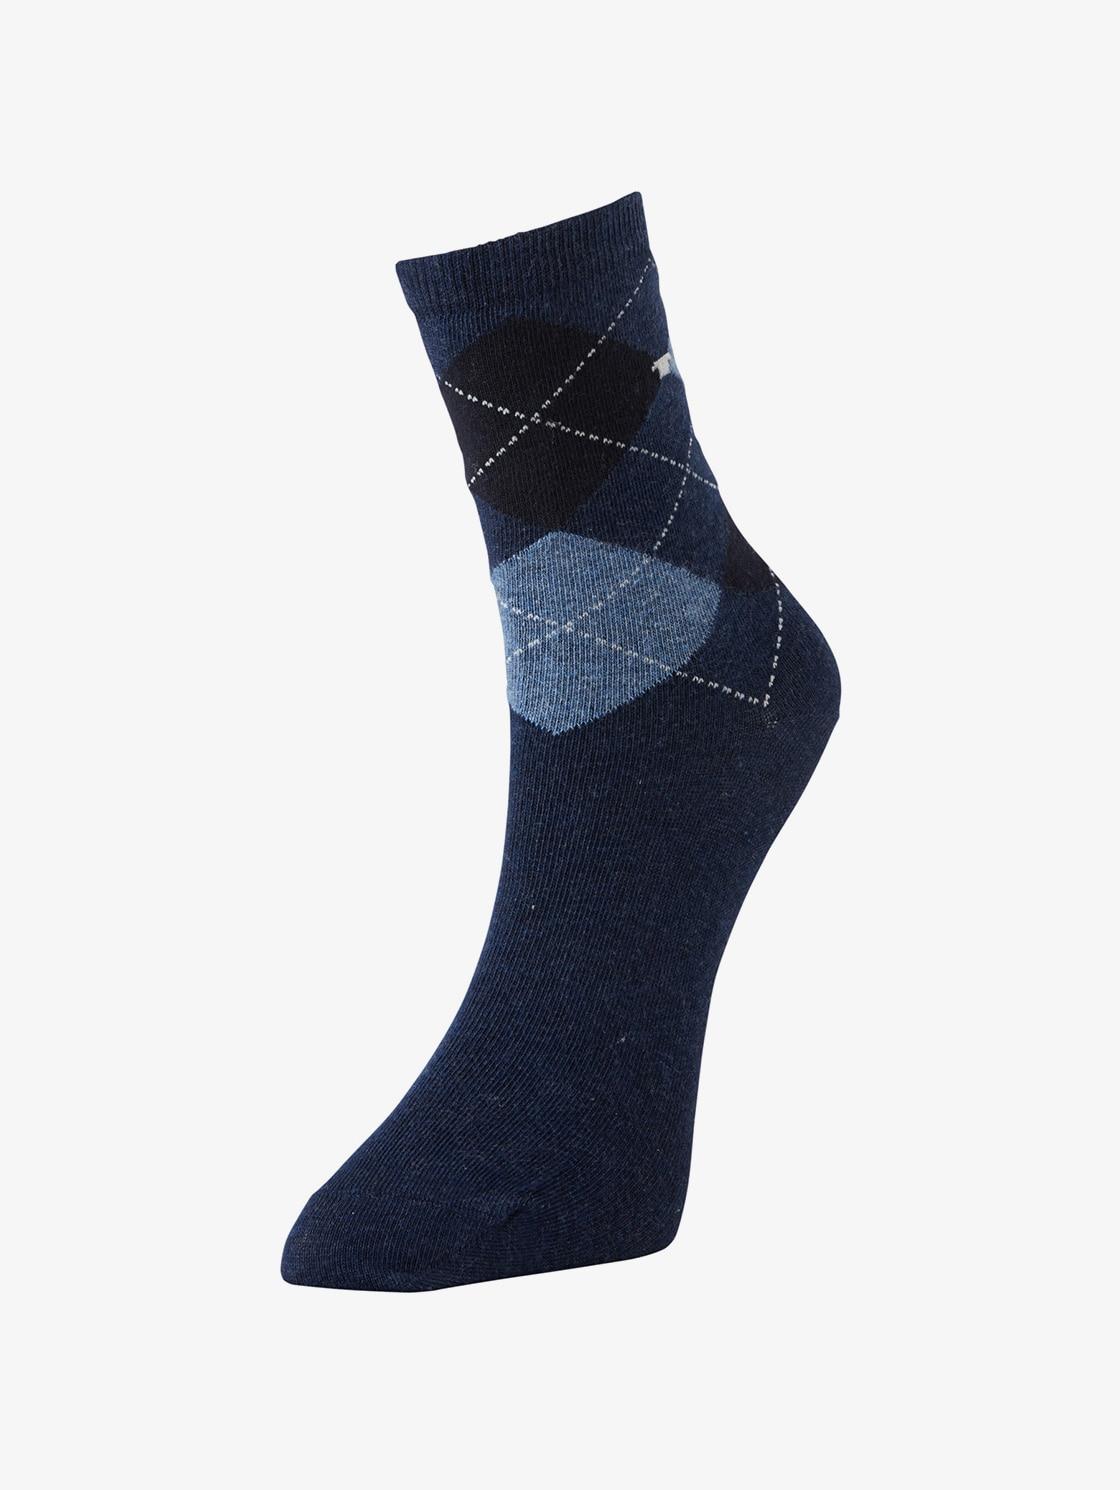 Tom Tailor Casual Socken im Doppelpack, Damen, indigo melange, Größe: 35 38